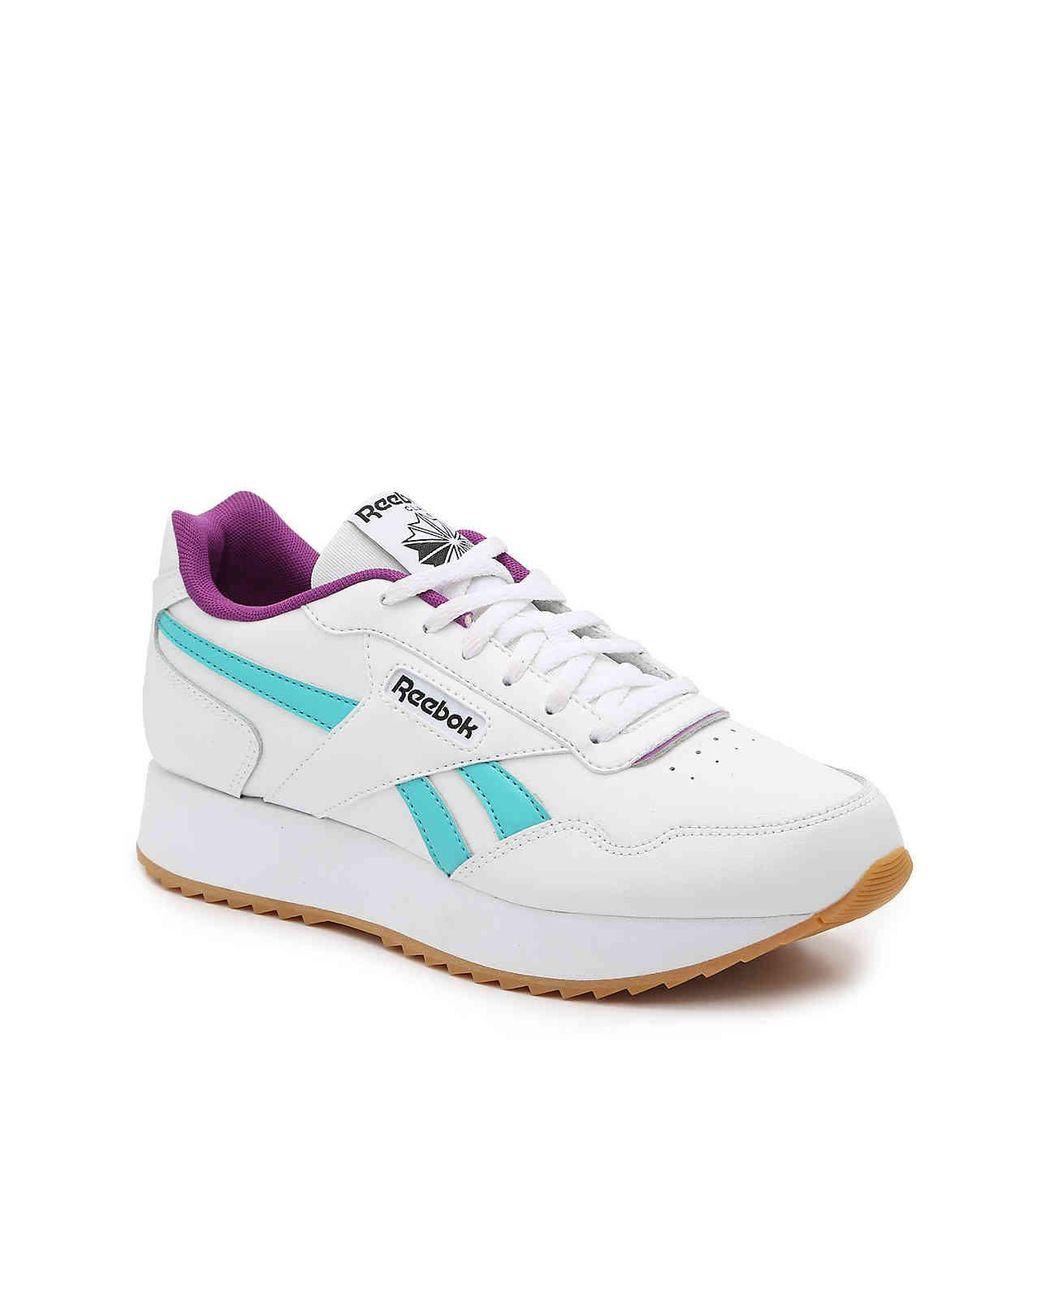 Reebok Leather Harman Platform Sneaker